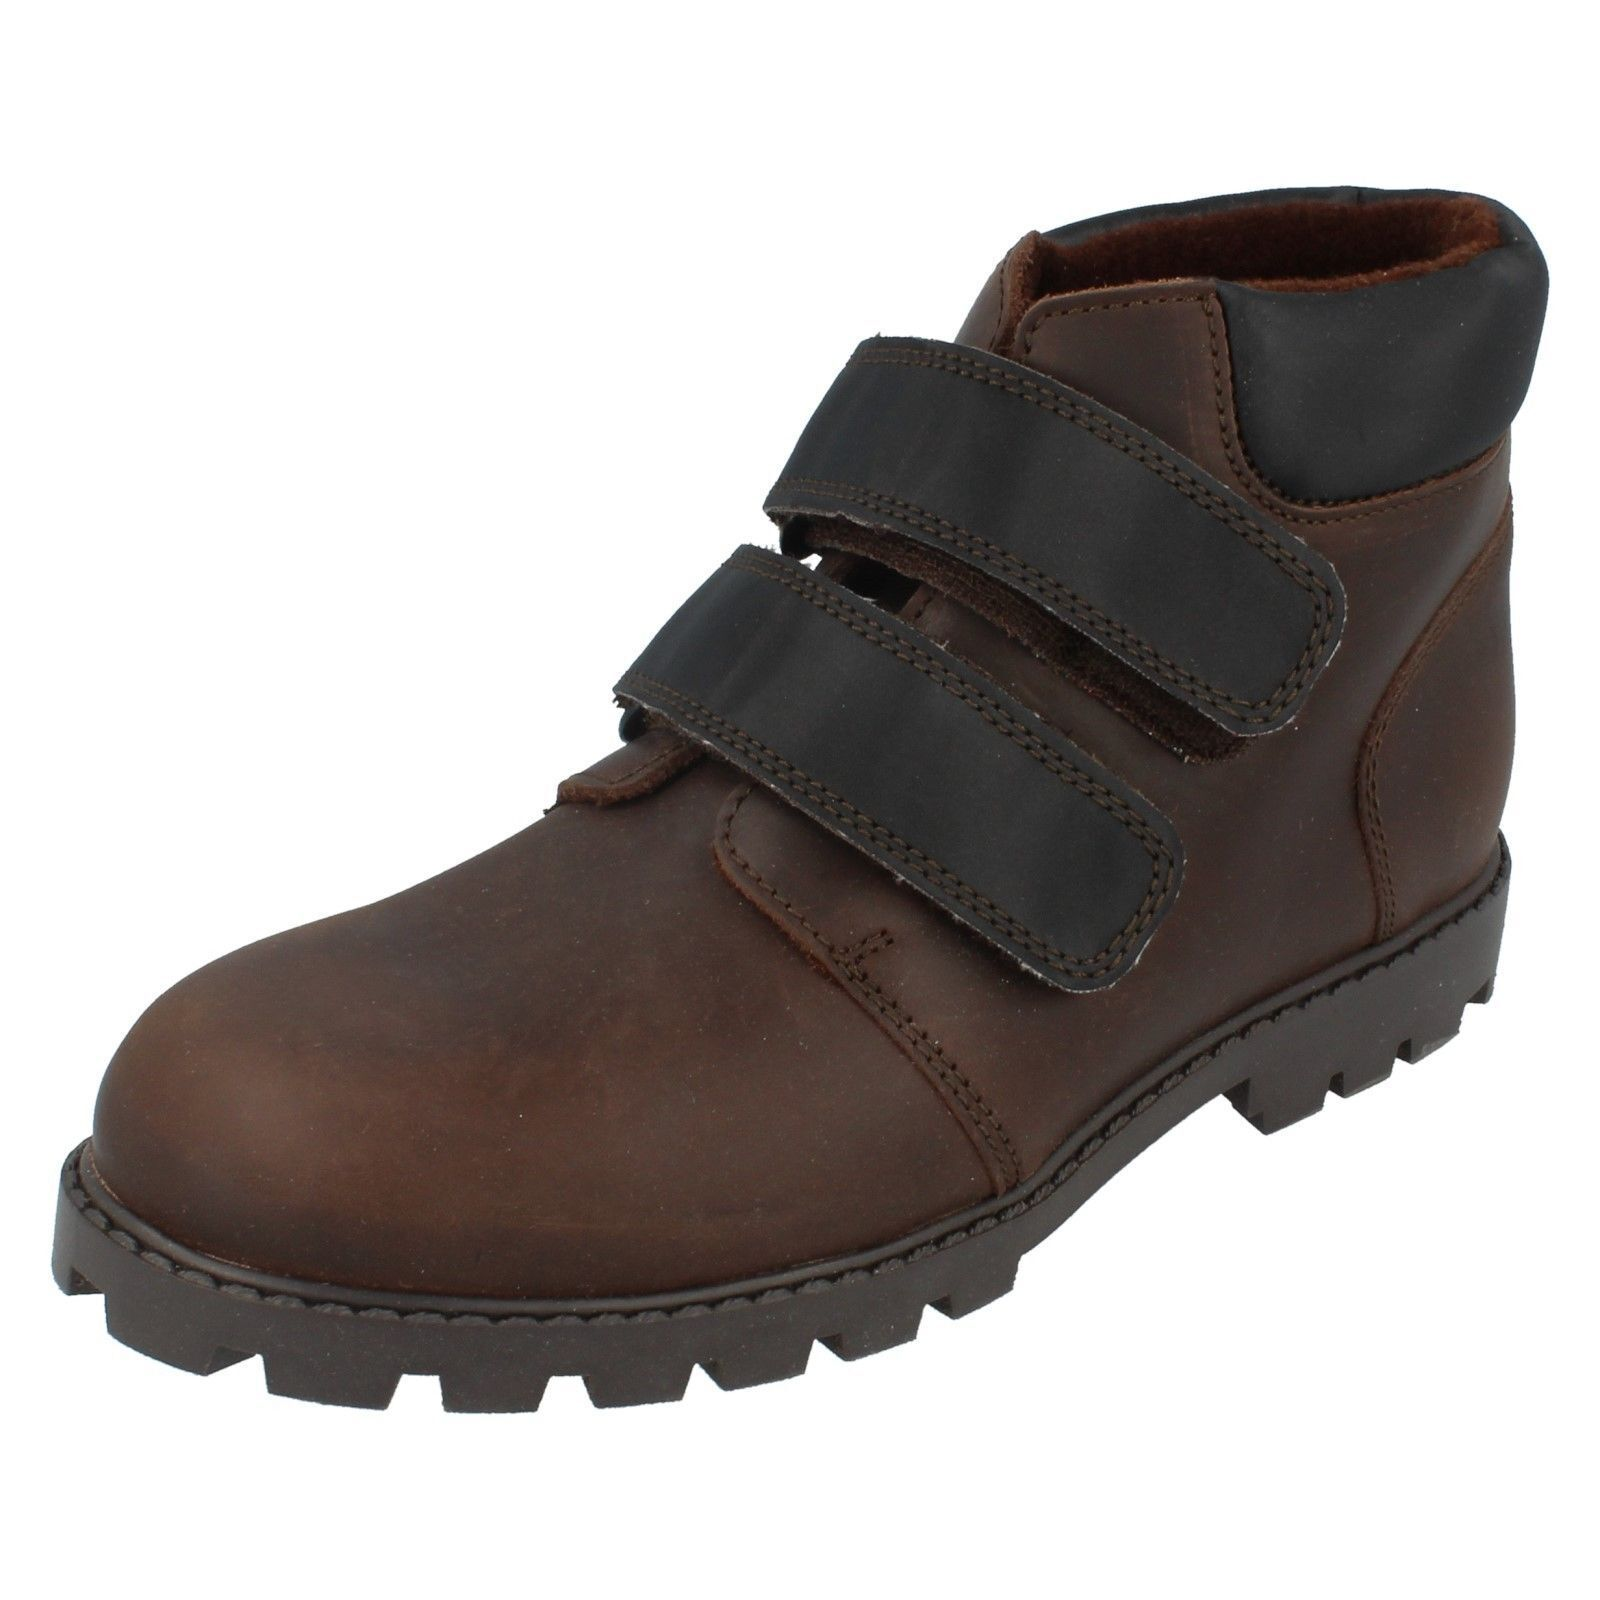 Hydrophane Dark Brown Leather Riptape strap ankle boot UK 1 HYDRO HOUNDZ